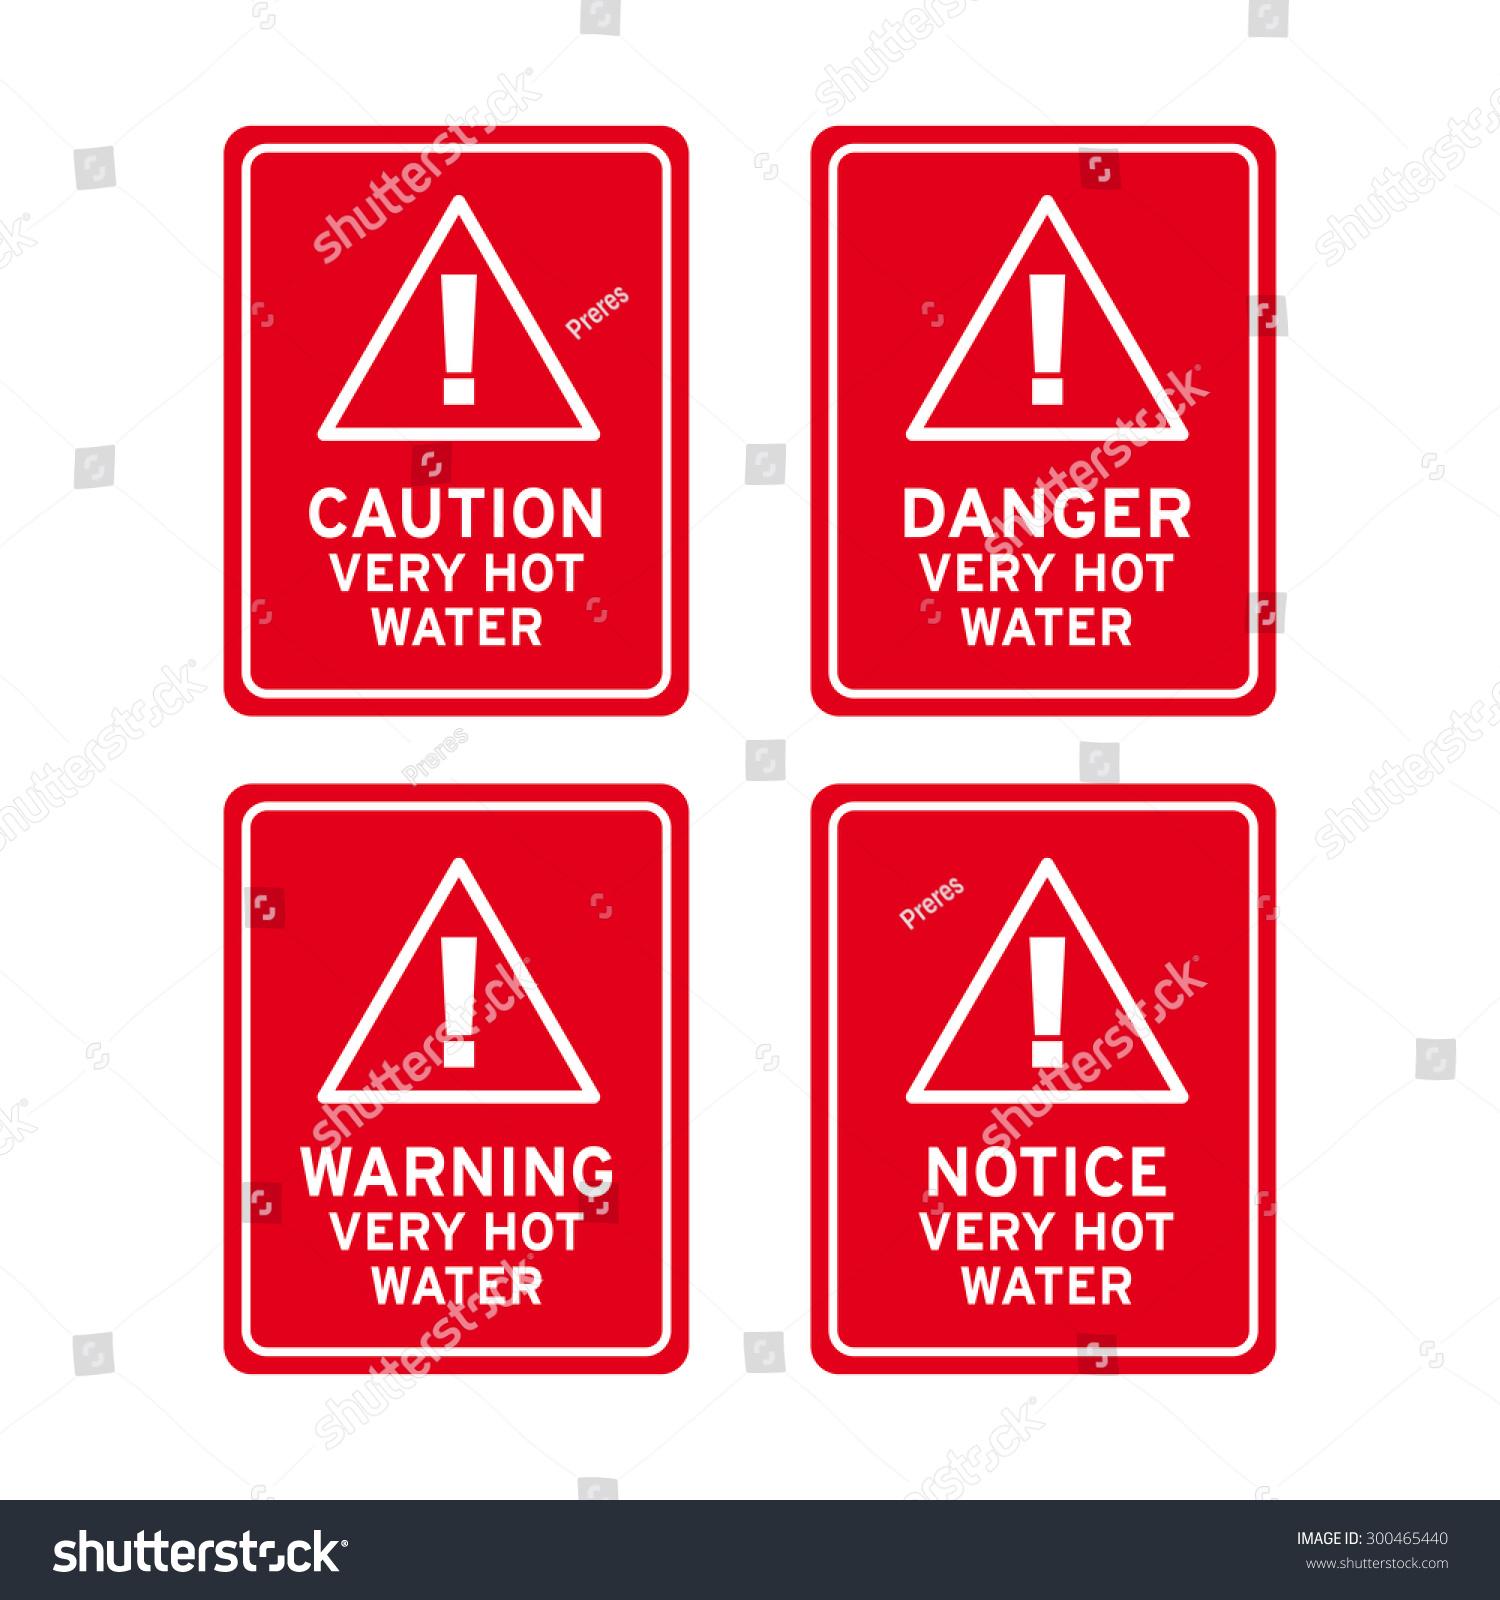 Warning Instant Hot Water : Hot water danger warning caution notice stock vector